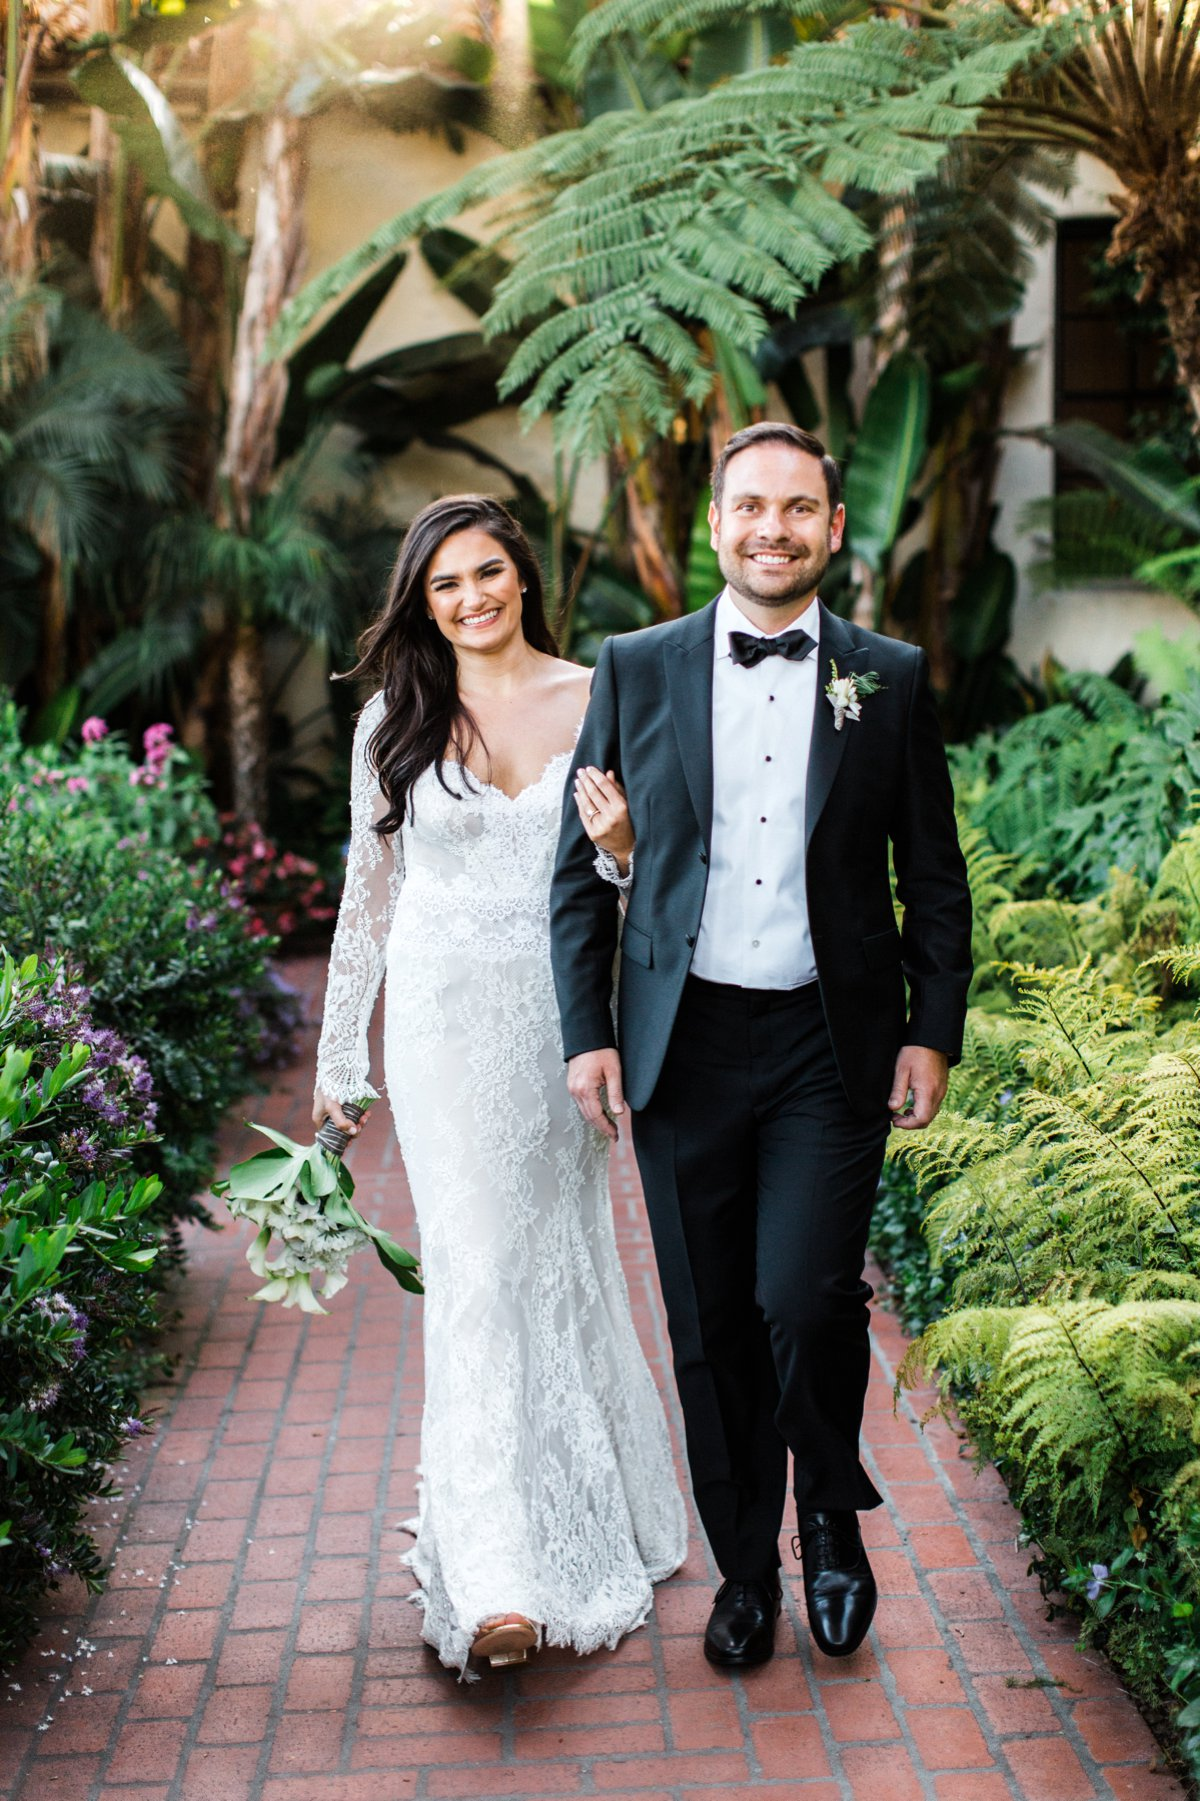 black tie wedding style - photo by Anna Delores https://ruffledblog.com/chic-modern-wedding-at-four-seasons-santa-barbara